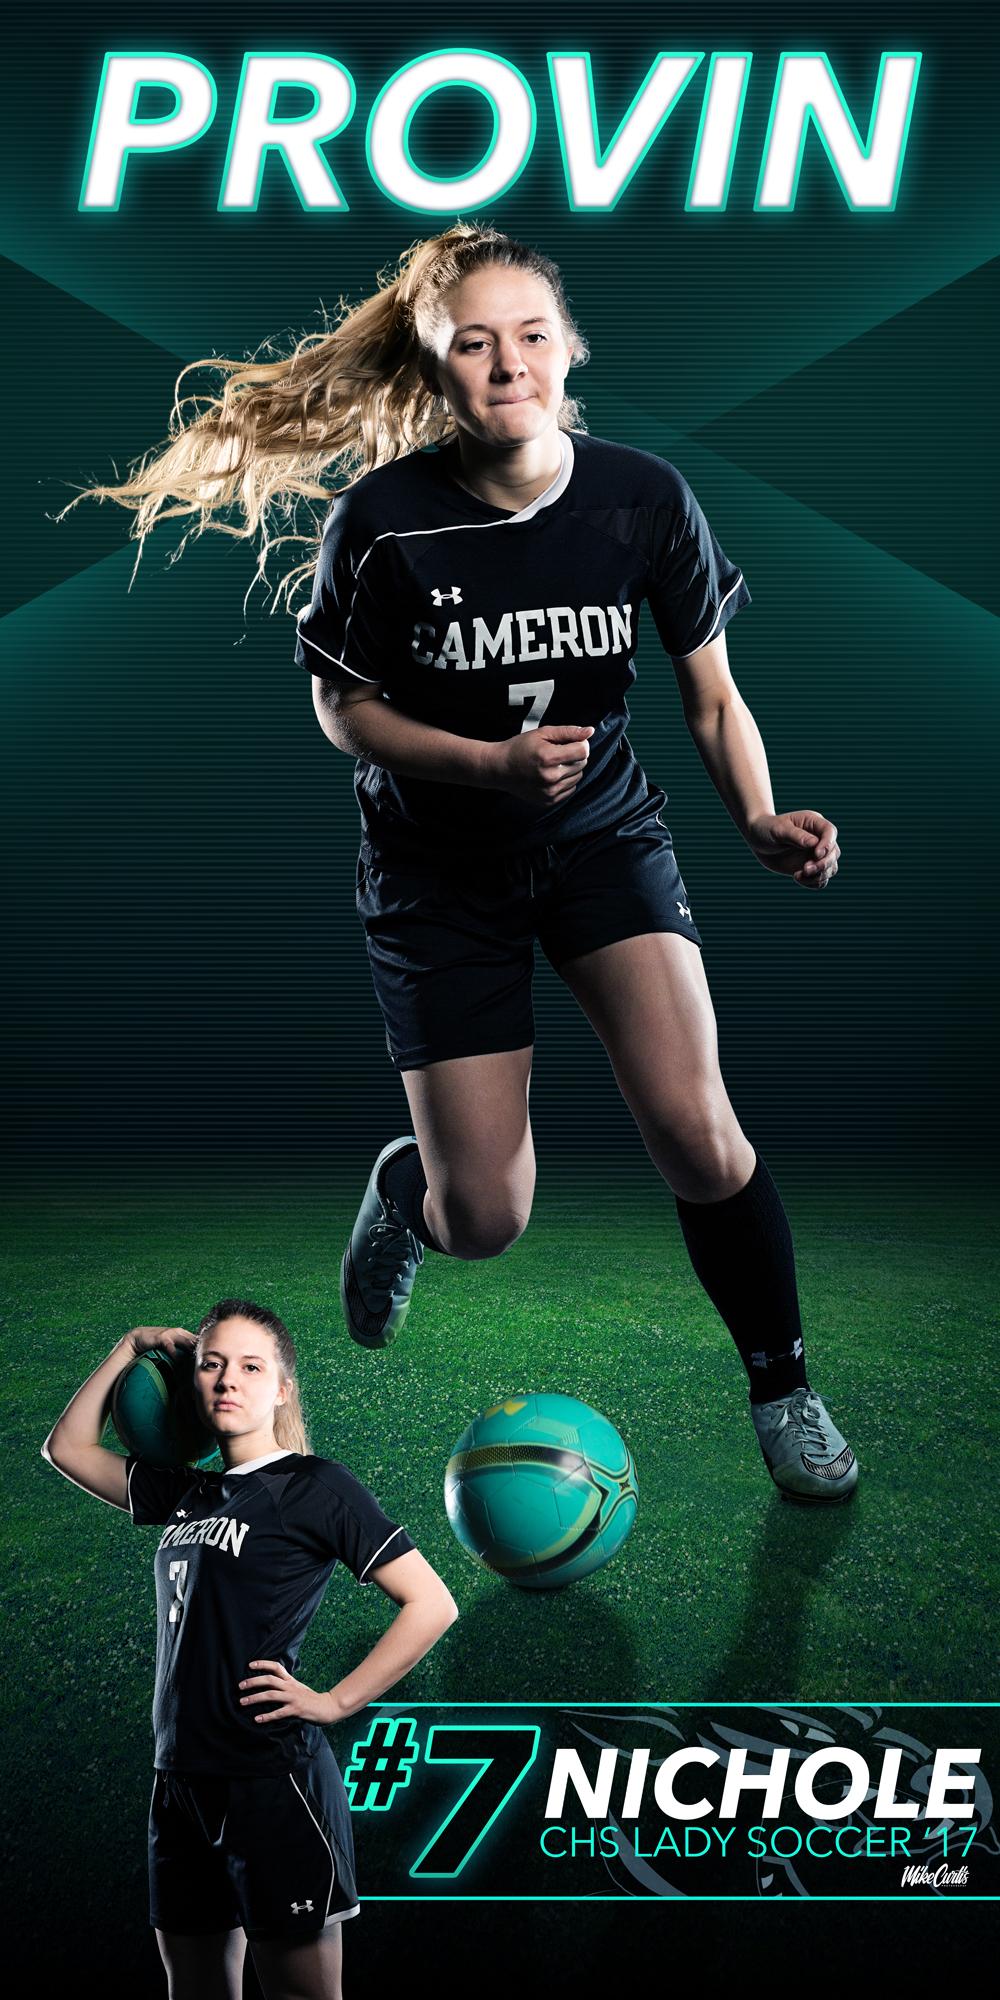 CHS-Lady-Soccer-17_Provin_2x4-Banner.jpg